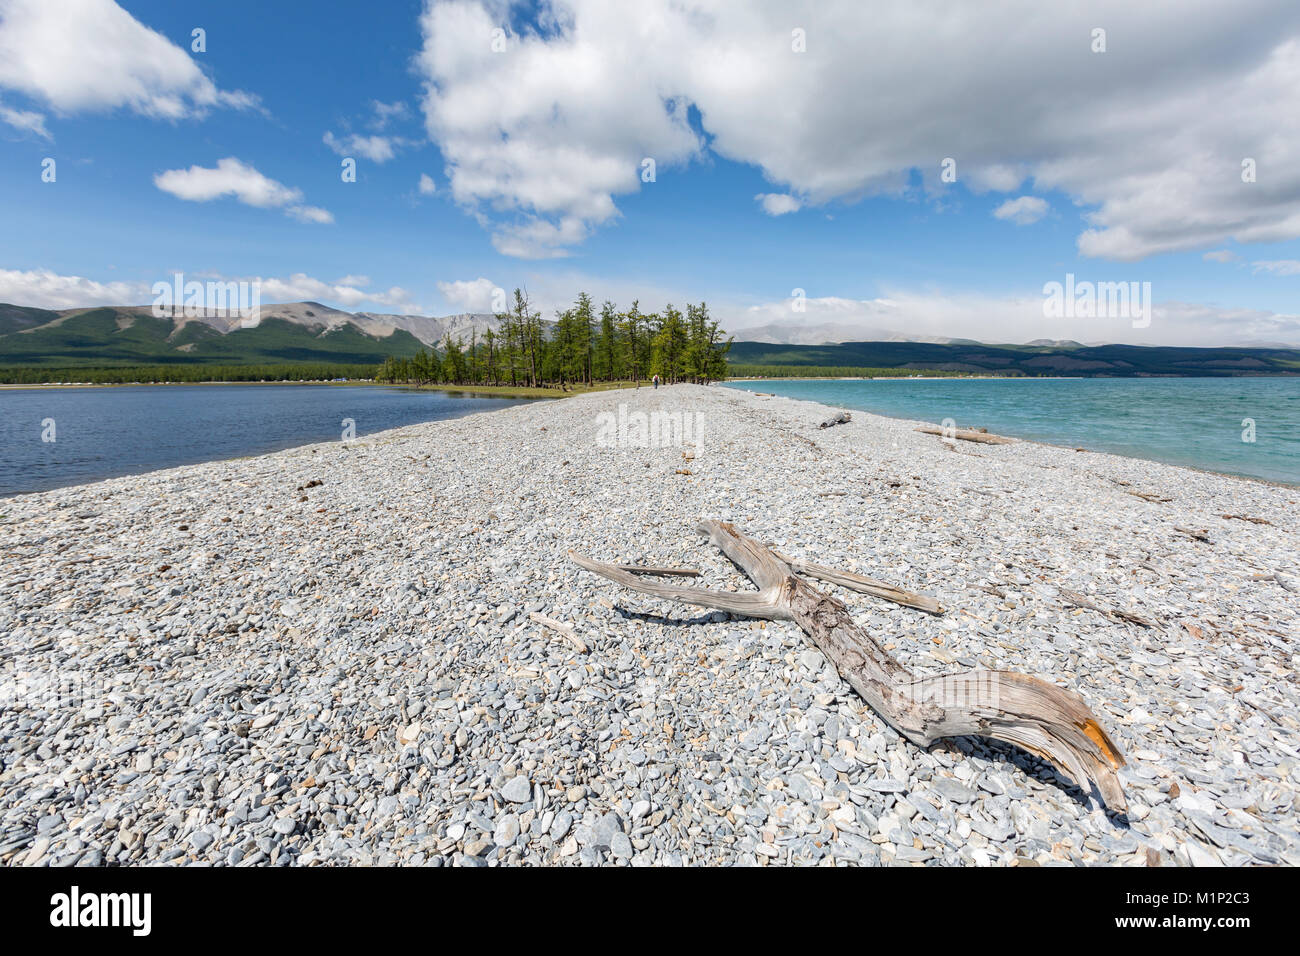 Pebble Shores von Hovsgol See, Provinz Hovsgol, Mongolei, Zentralasien, Asien Stockbild